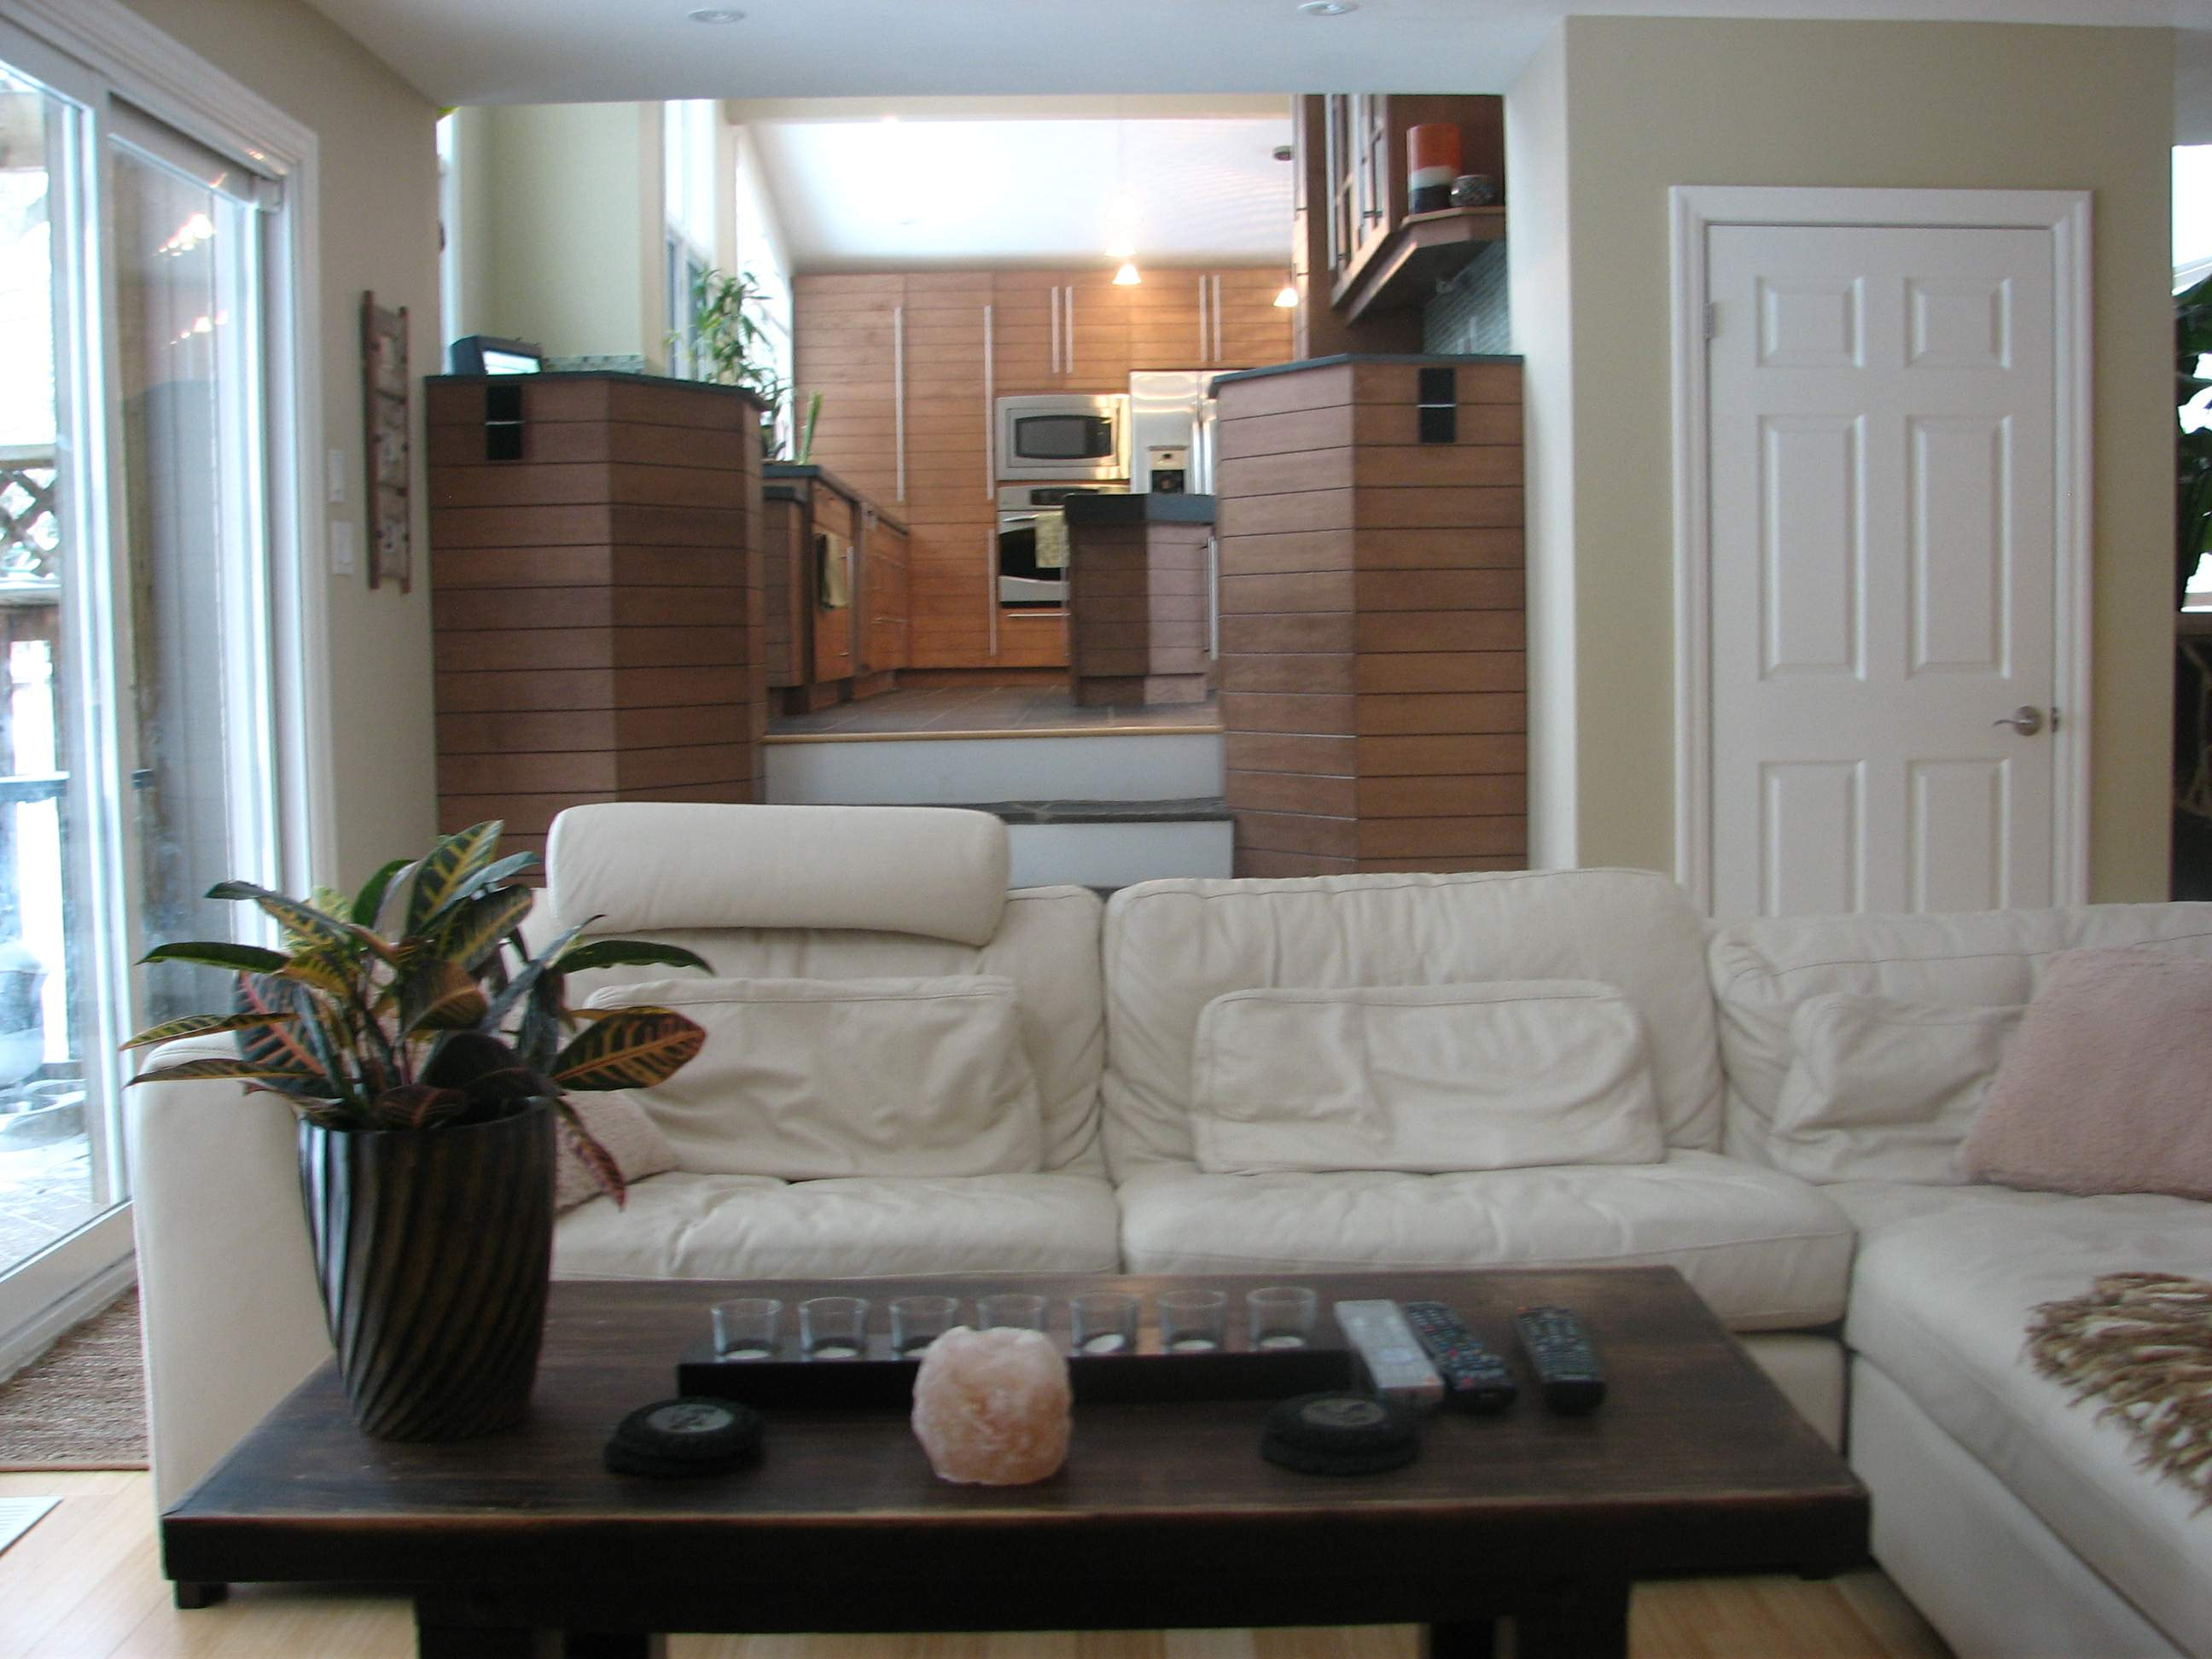 California Dream Residence Reno